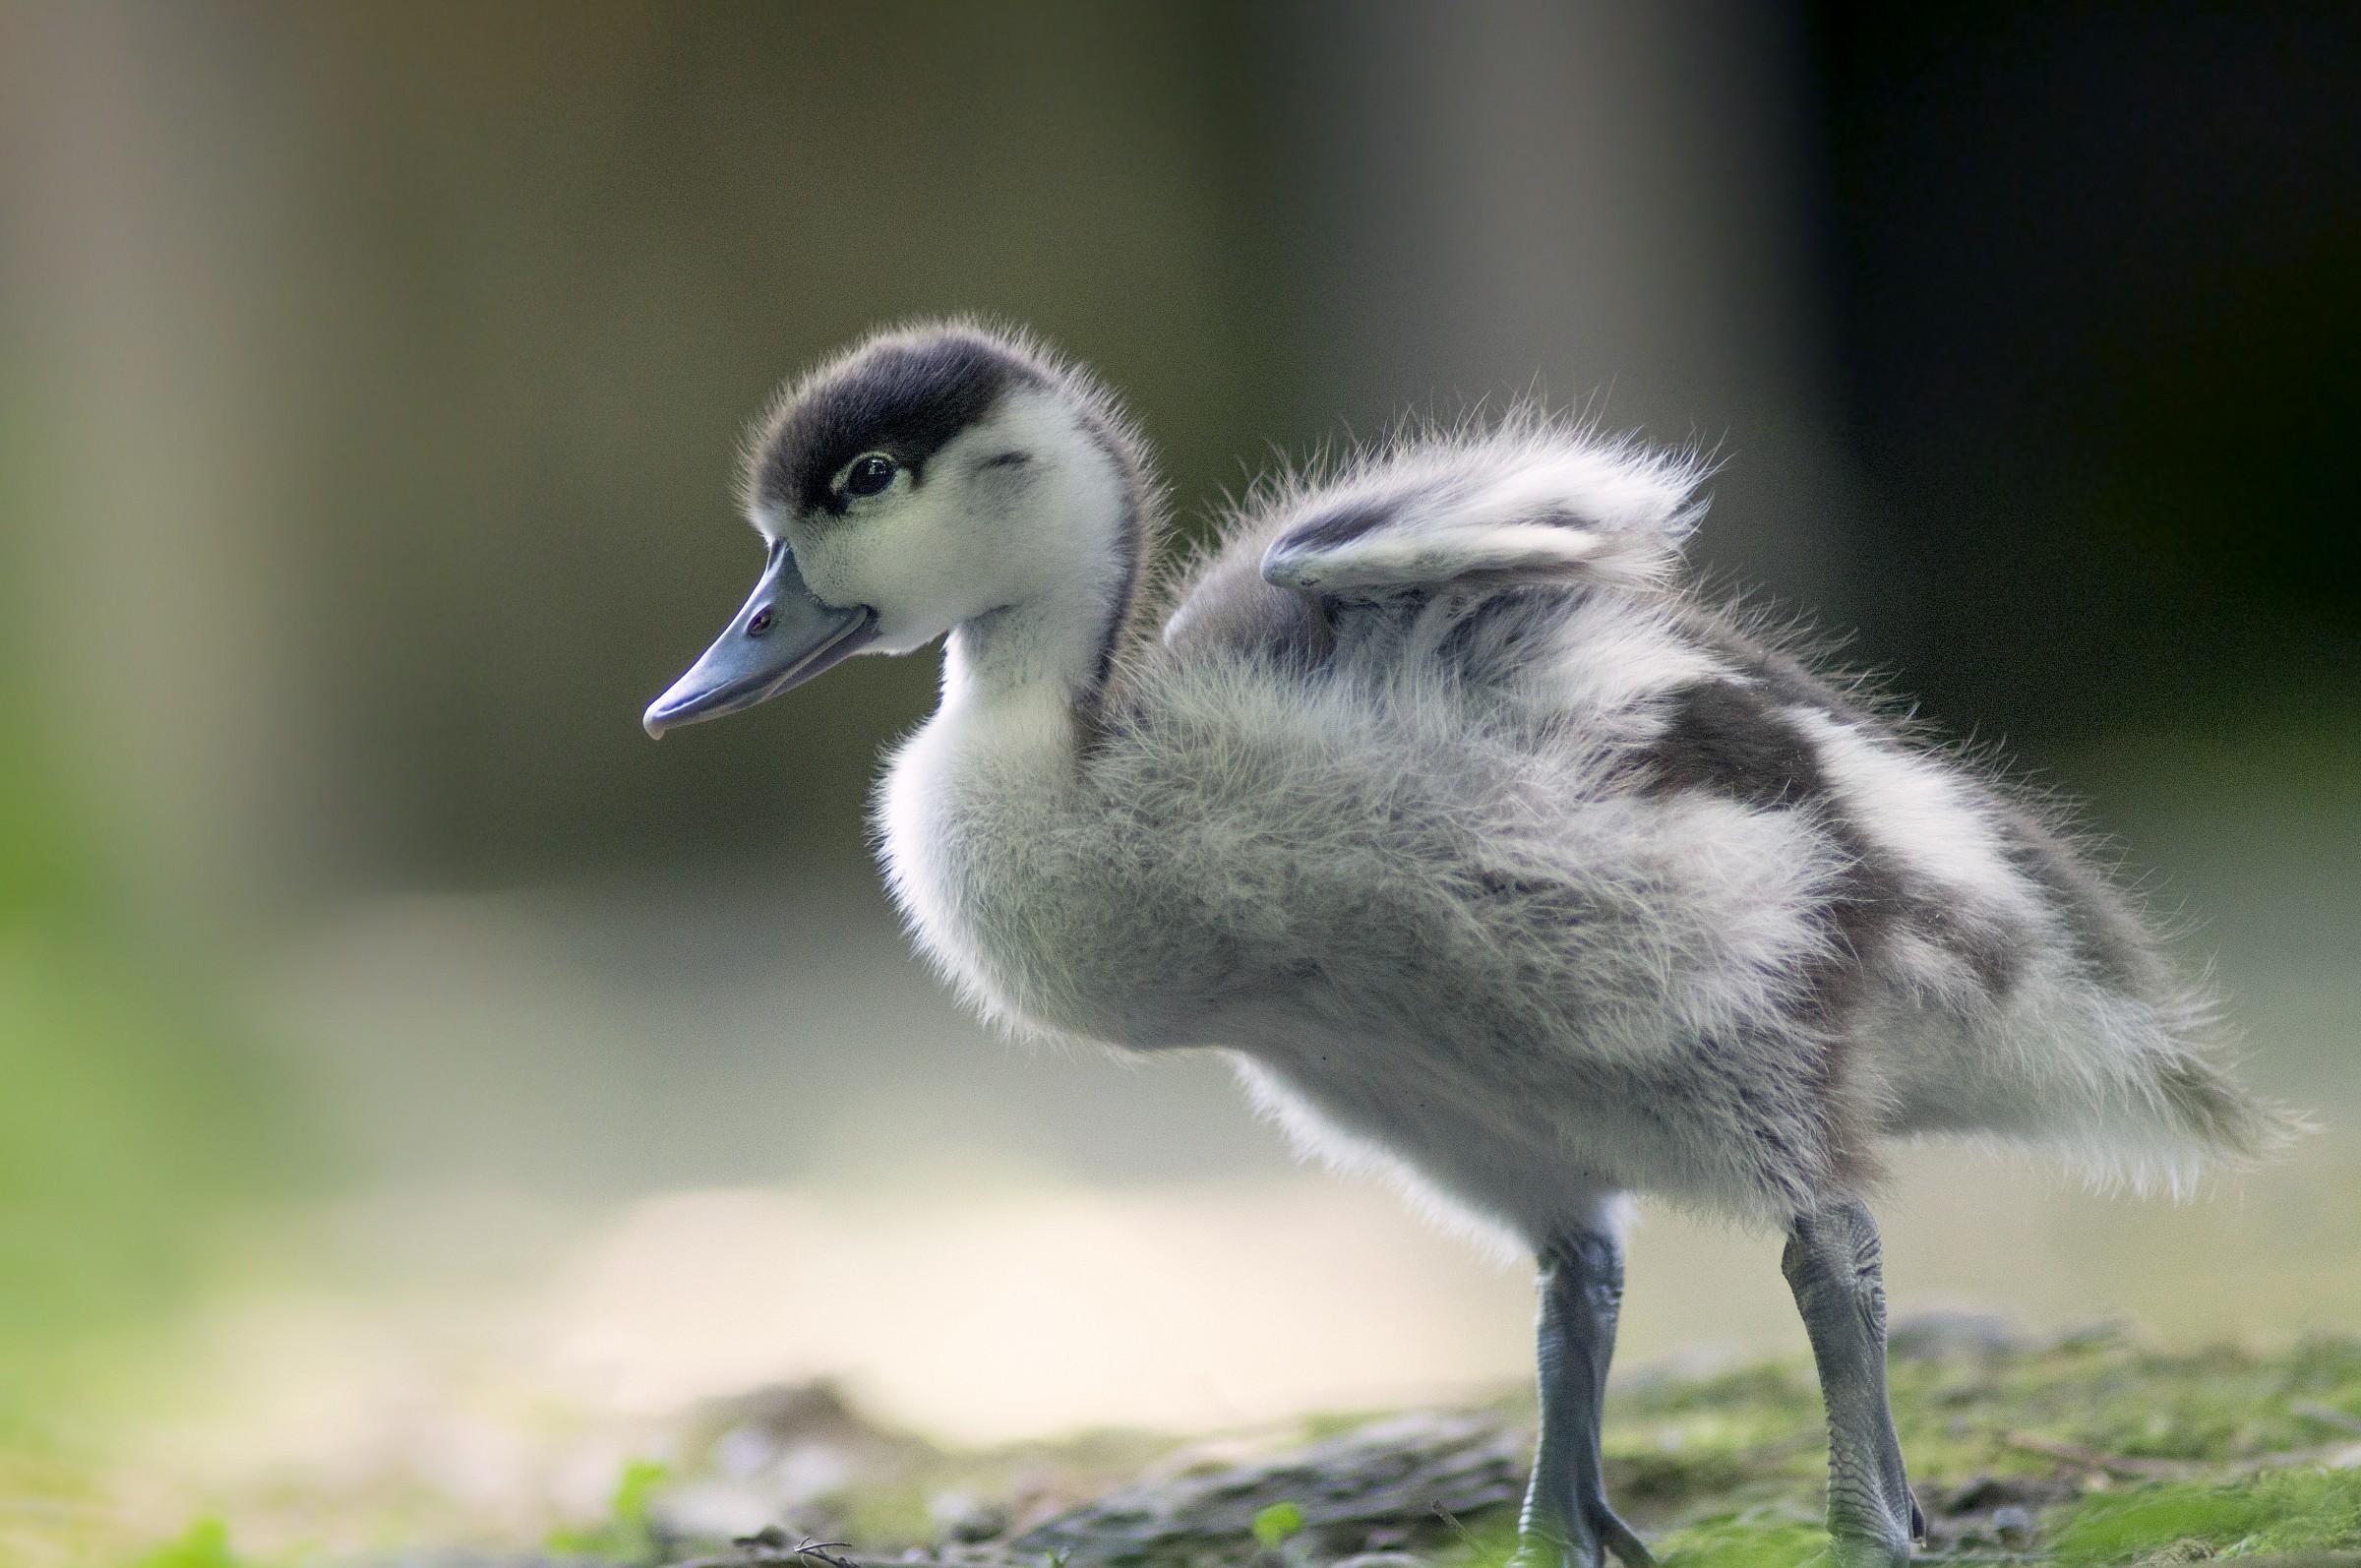 Chick...